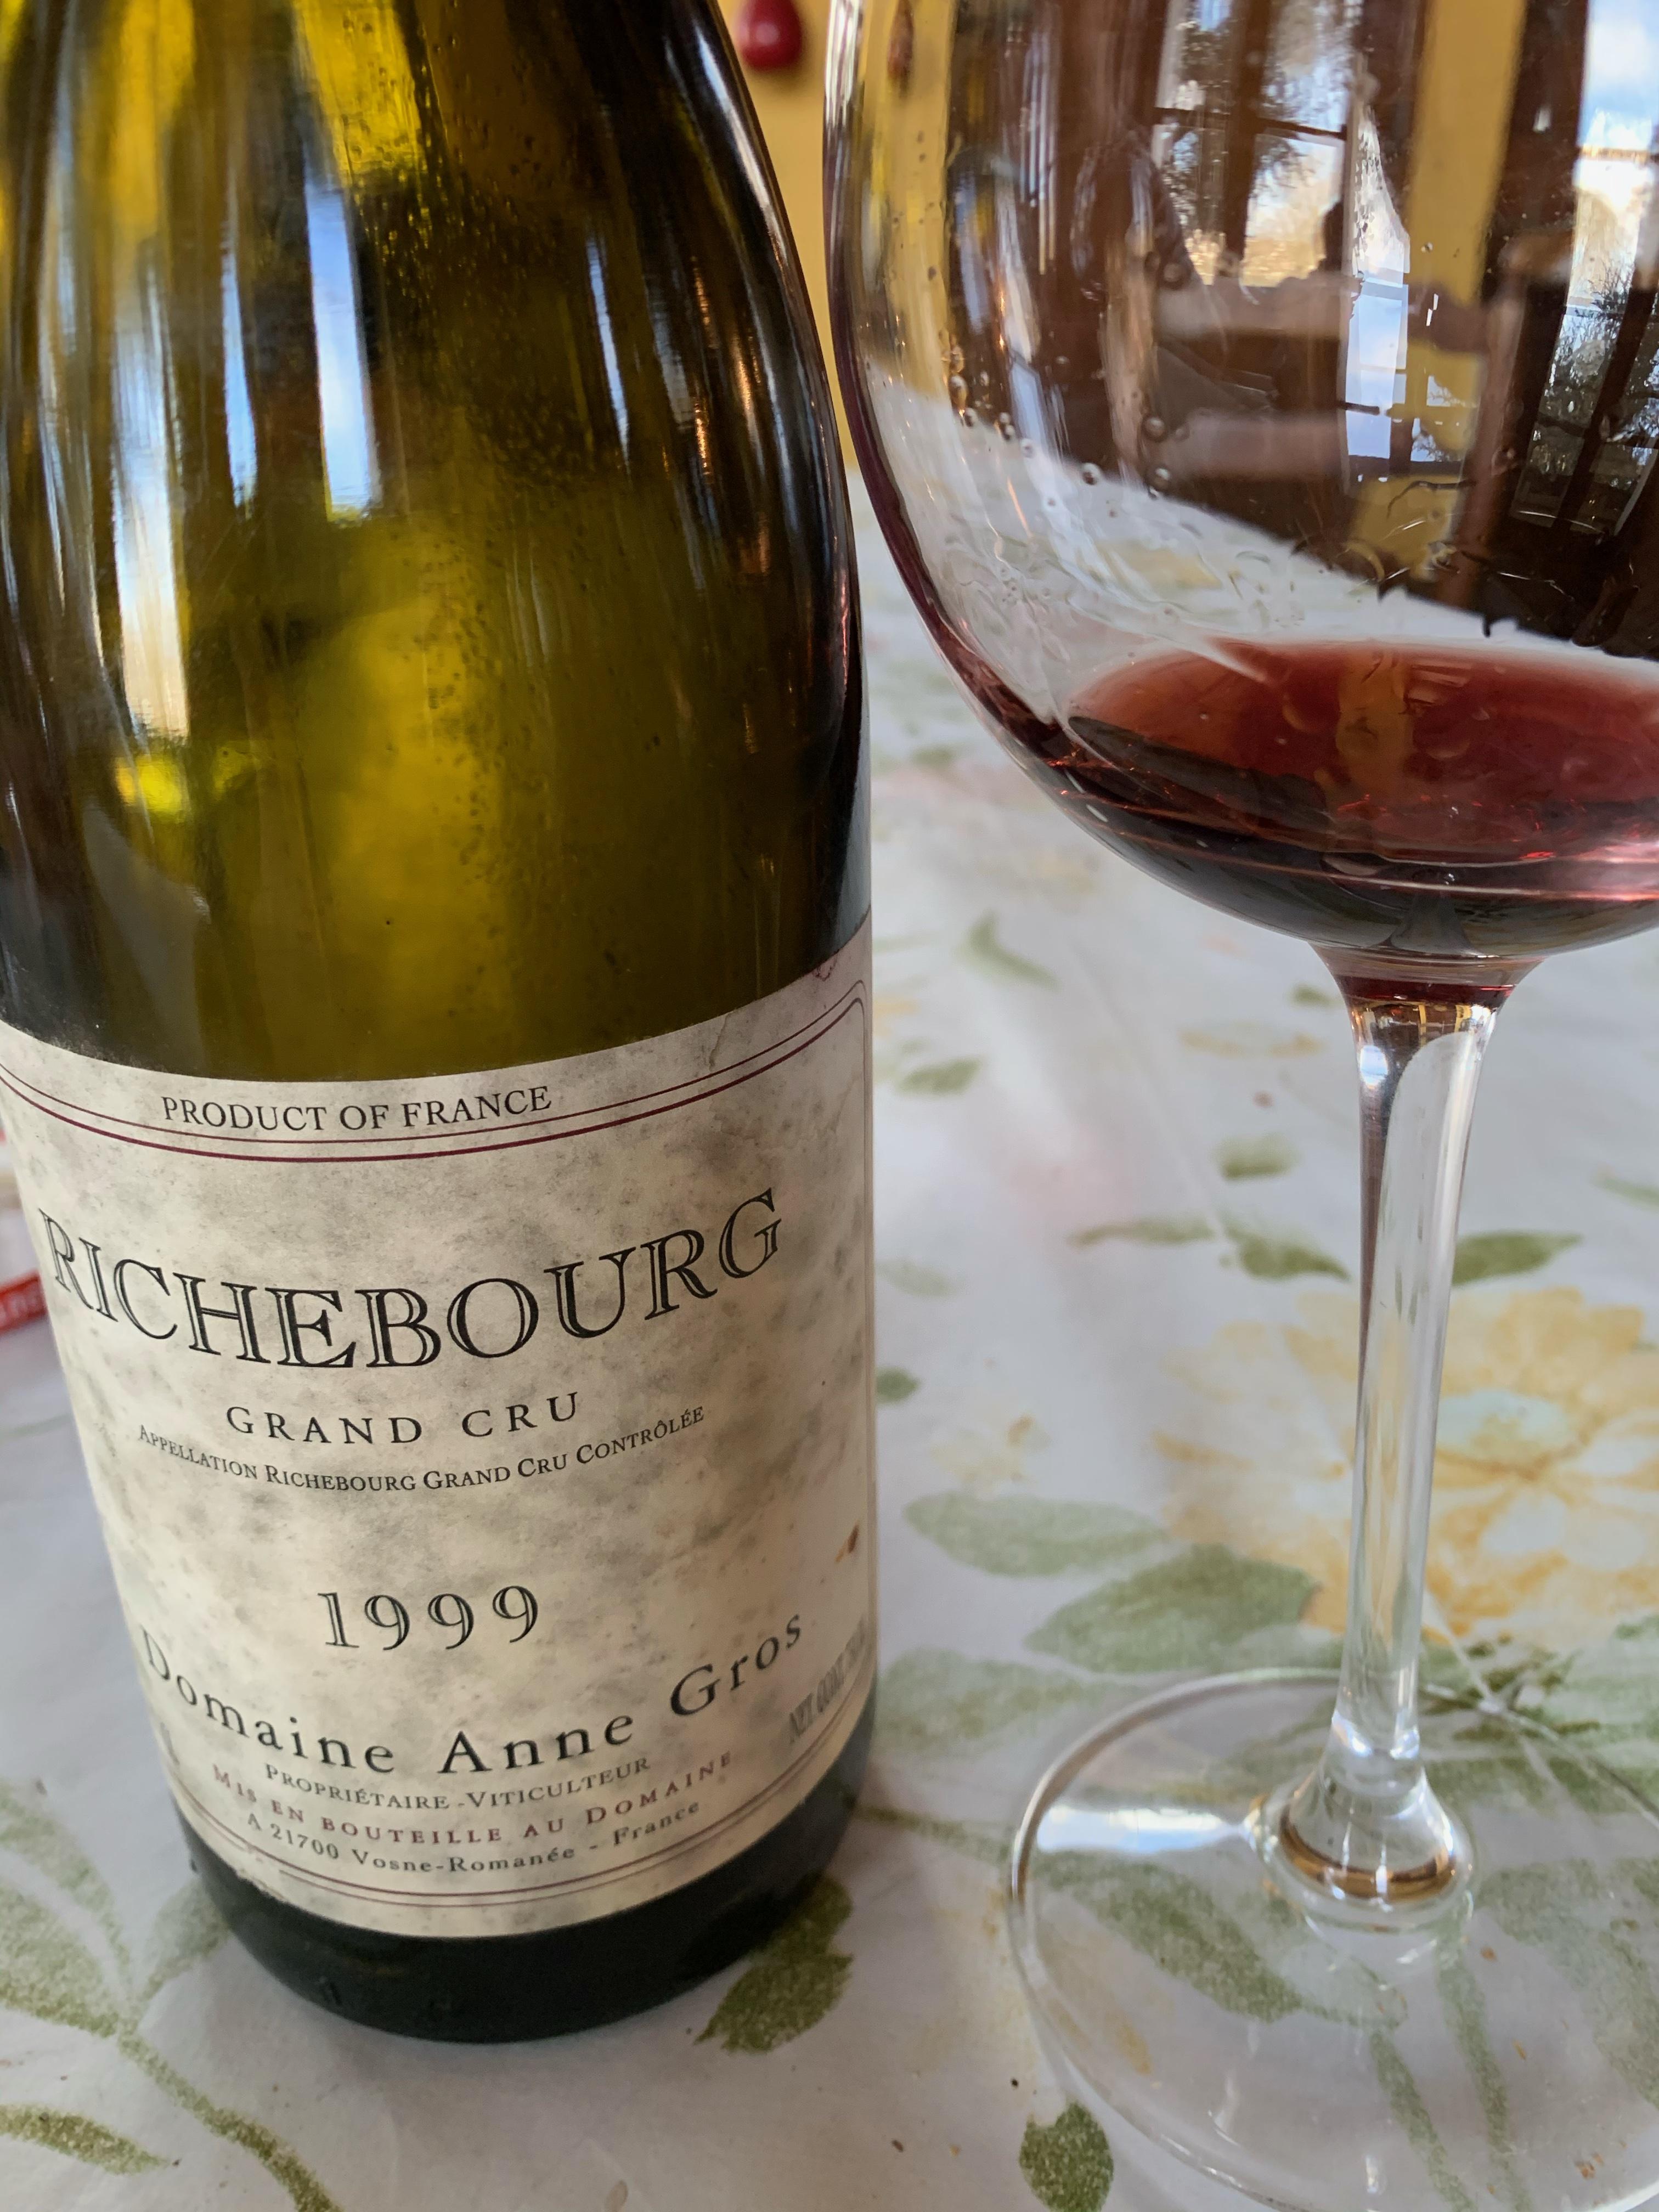 Richebourg Grand Cru 1999 - Domaine Anne Gros